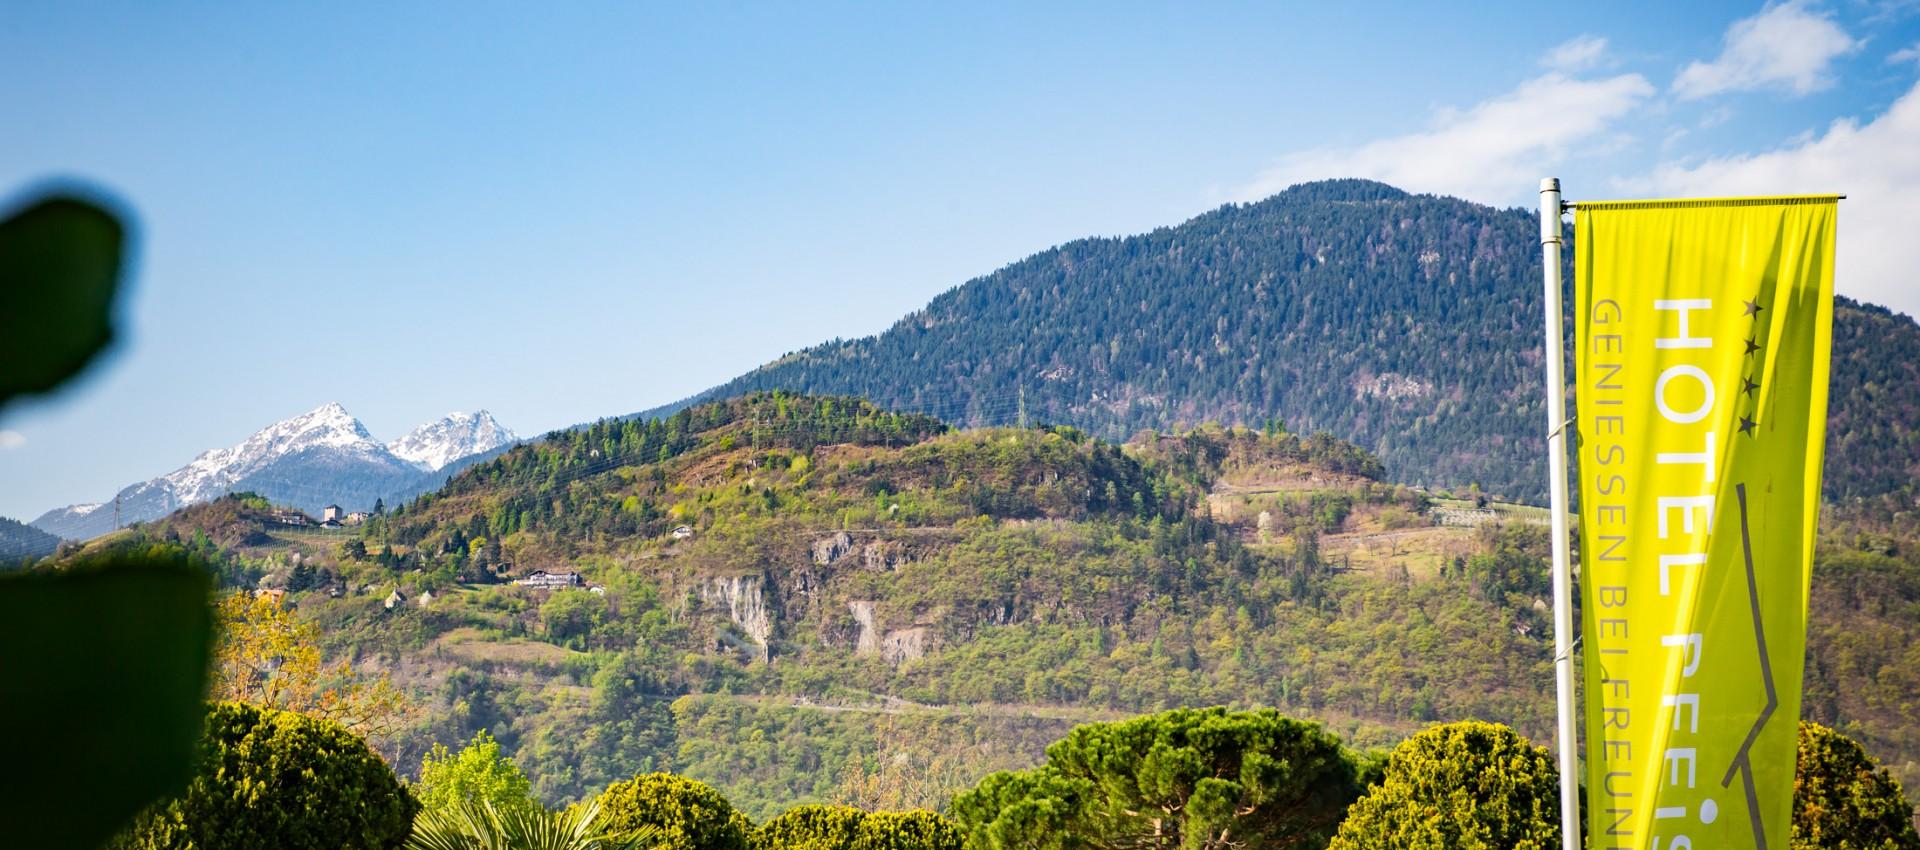 Wandern in Südtirol, Urlaub in den Bergen